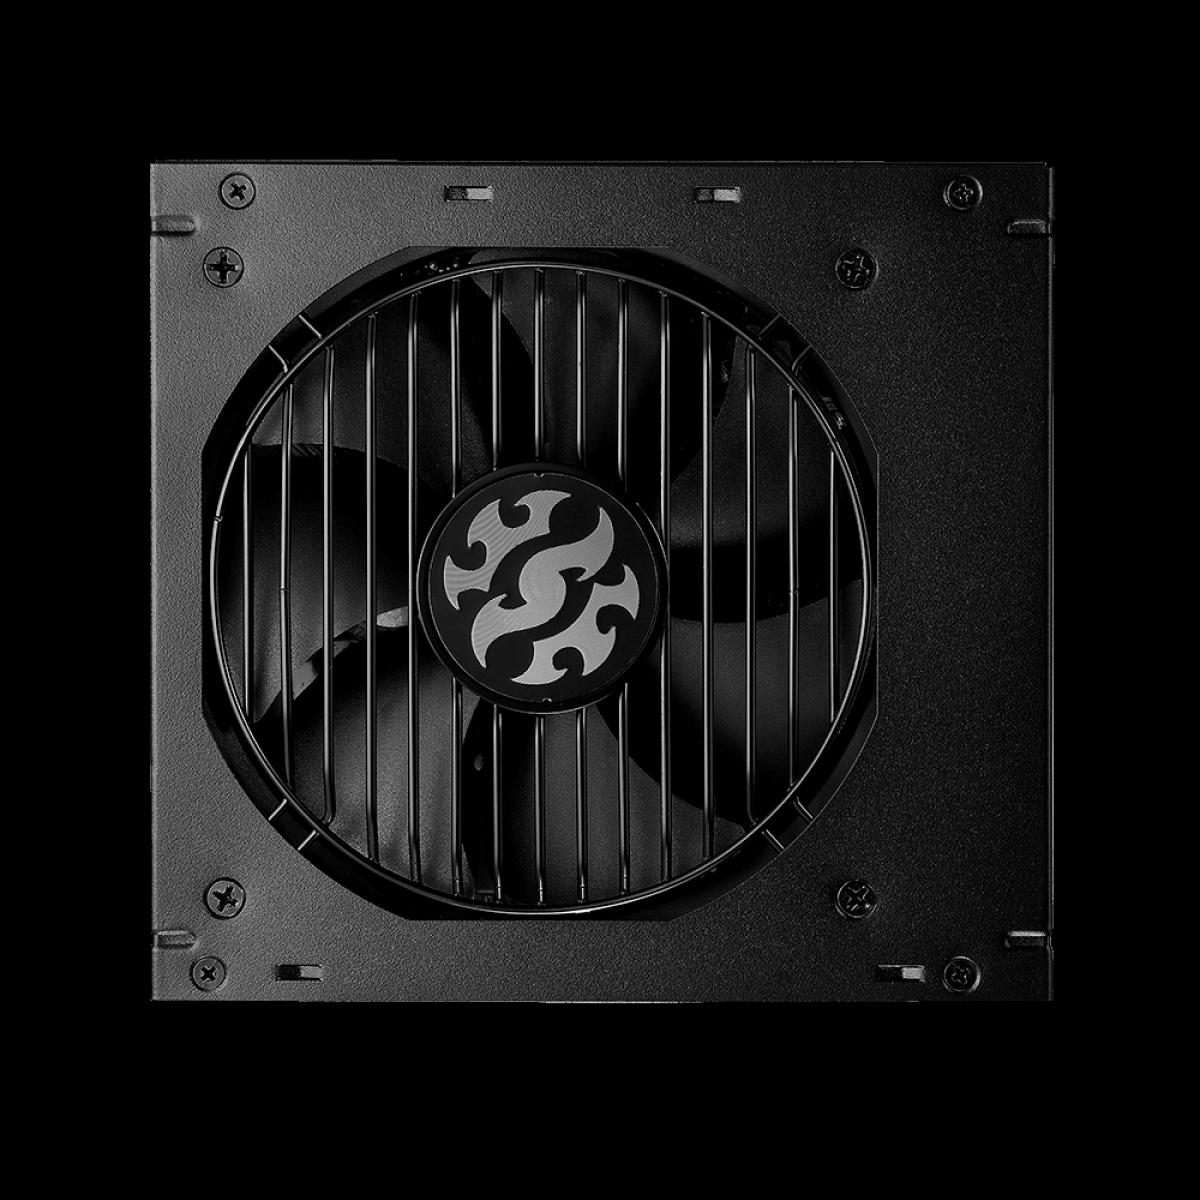 Fonte XPG, Core Reactor, 850W, 80 Plus Gold, Modular, PFC Ativo, 75260040